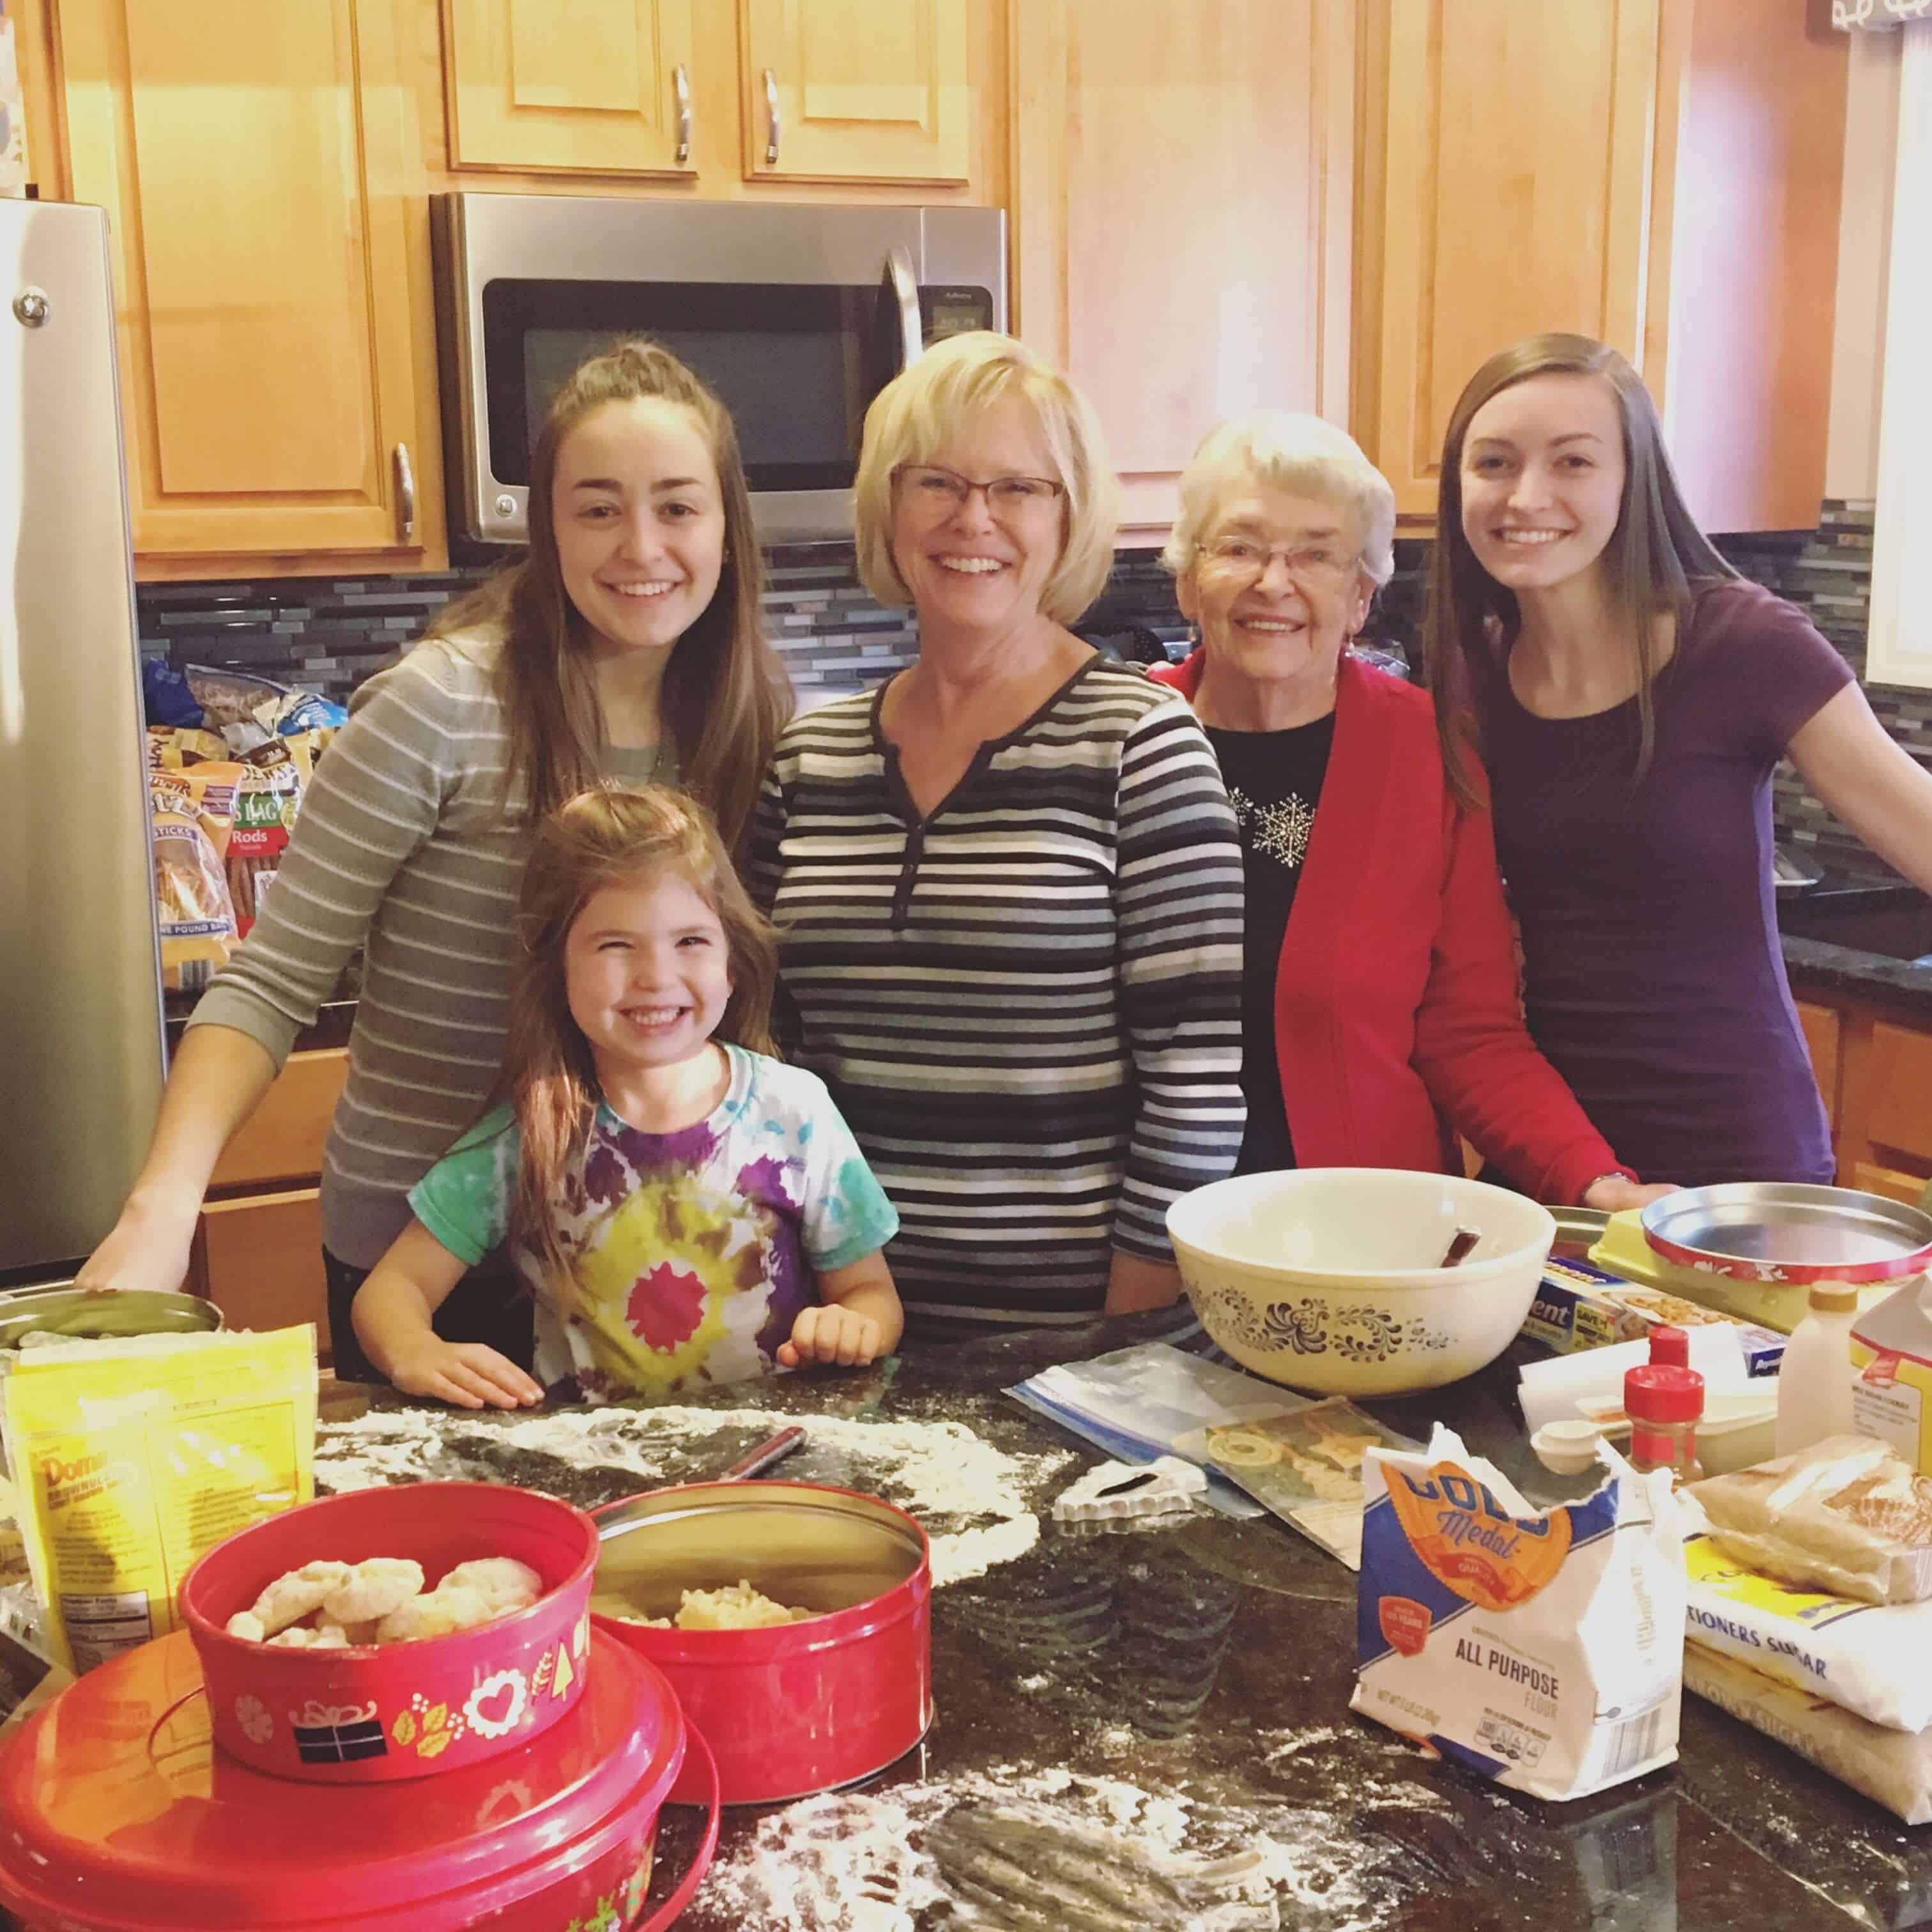 funnel cake rosette christmas cookies, making memories through baking